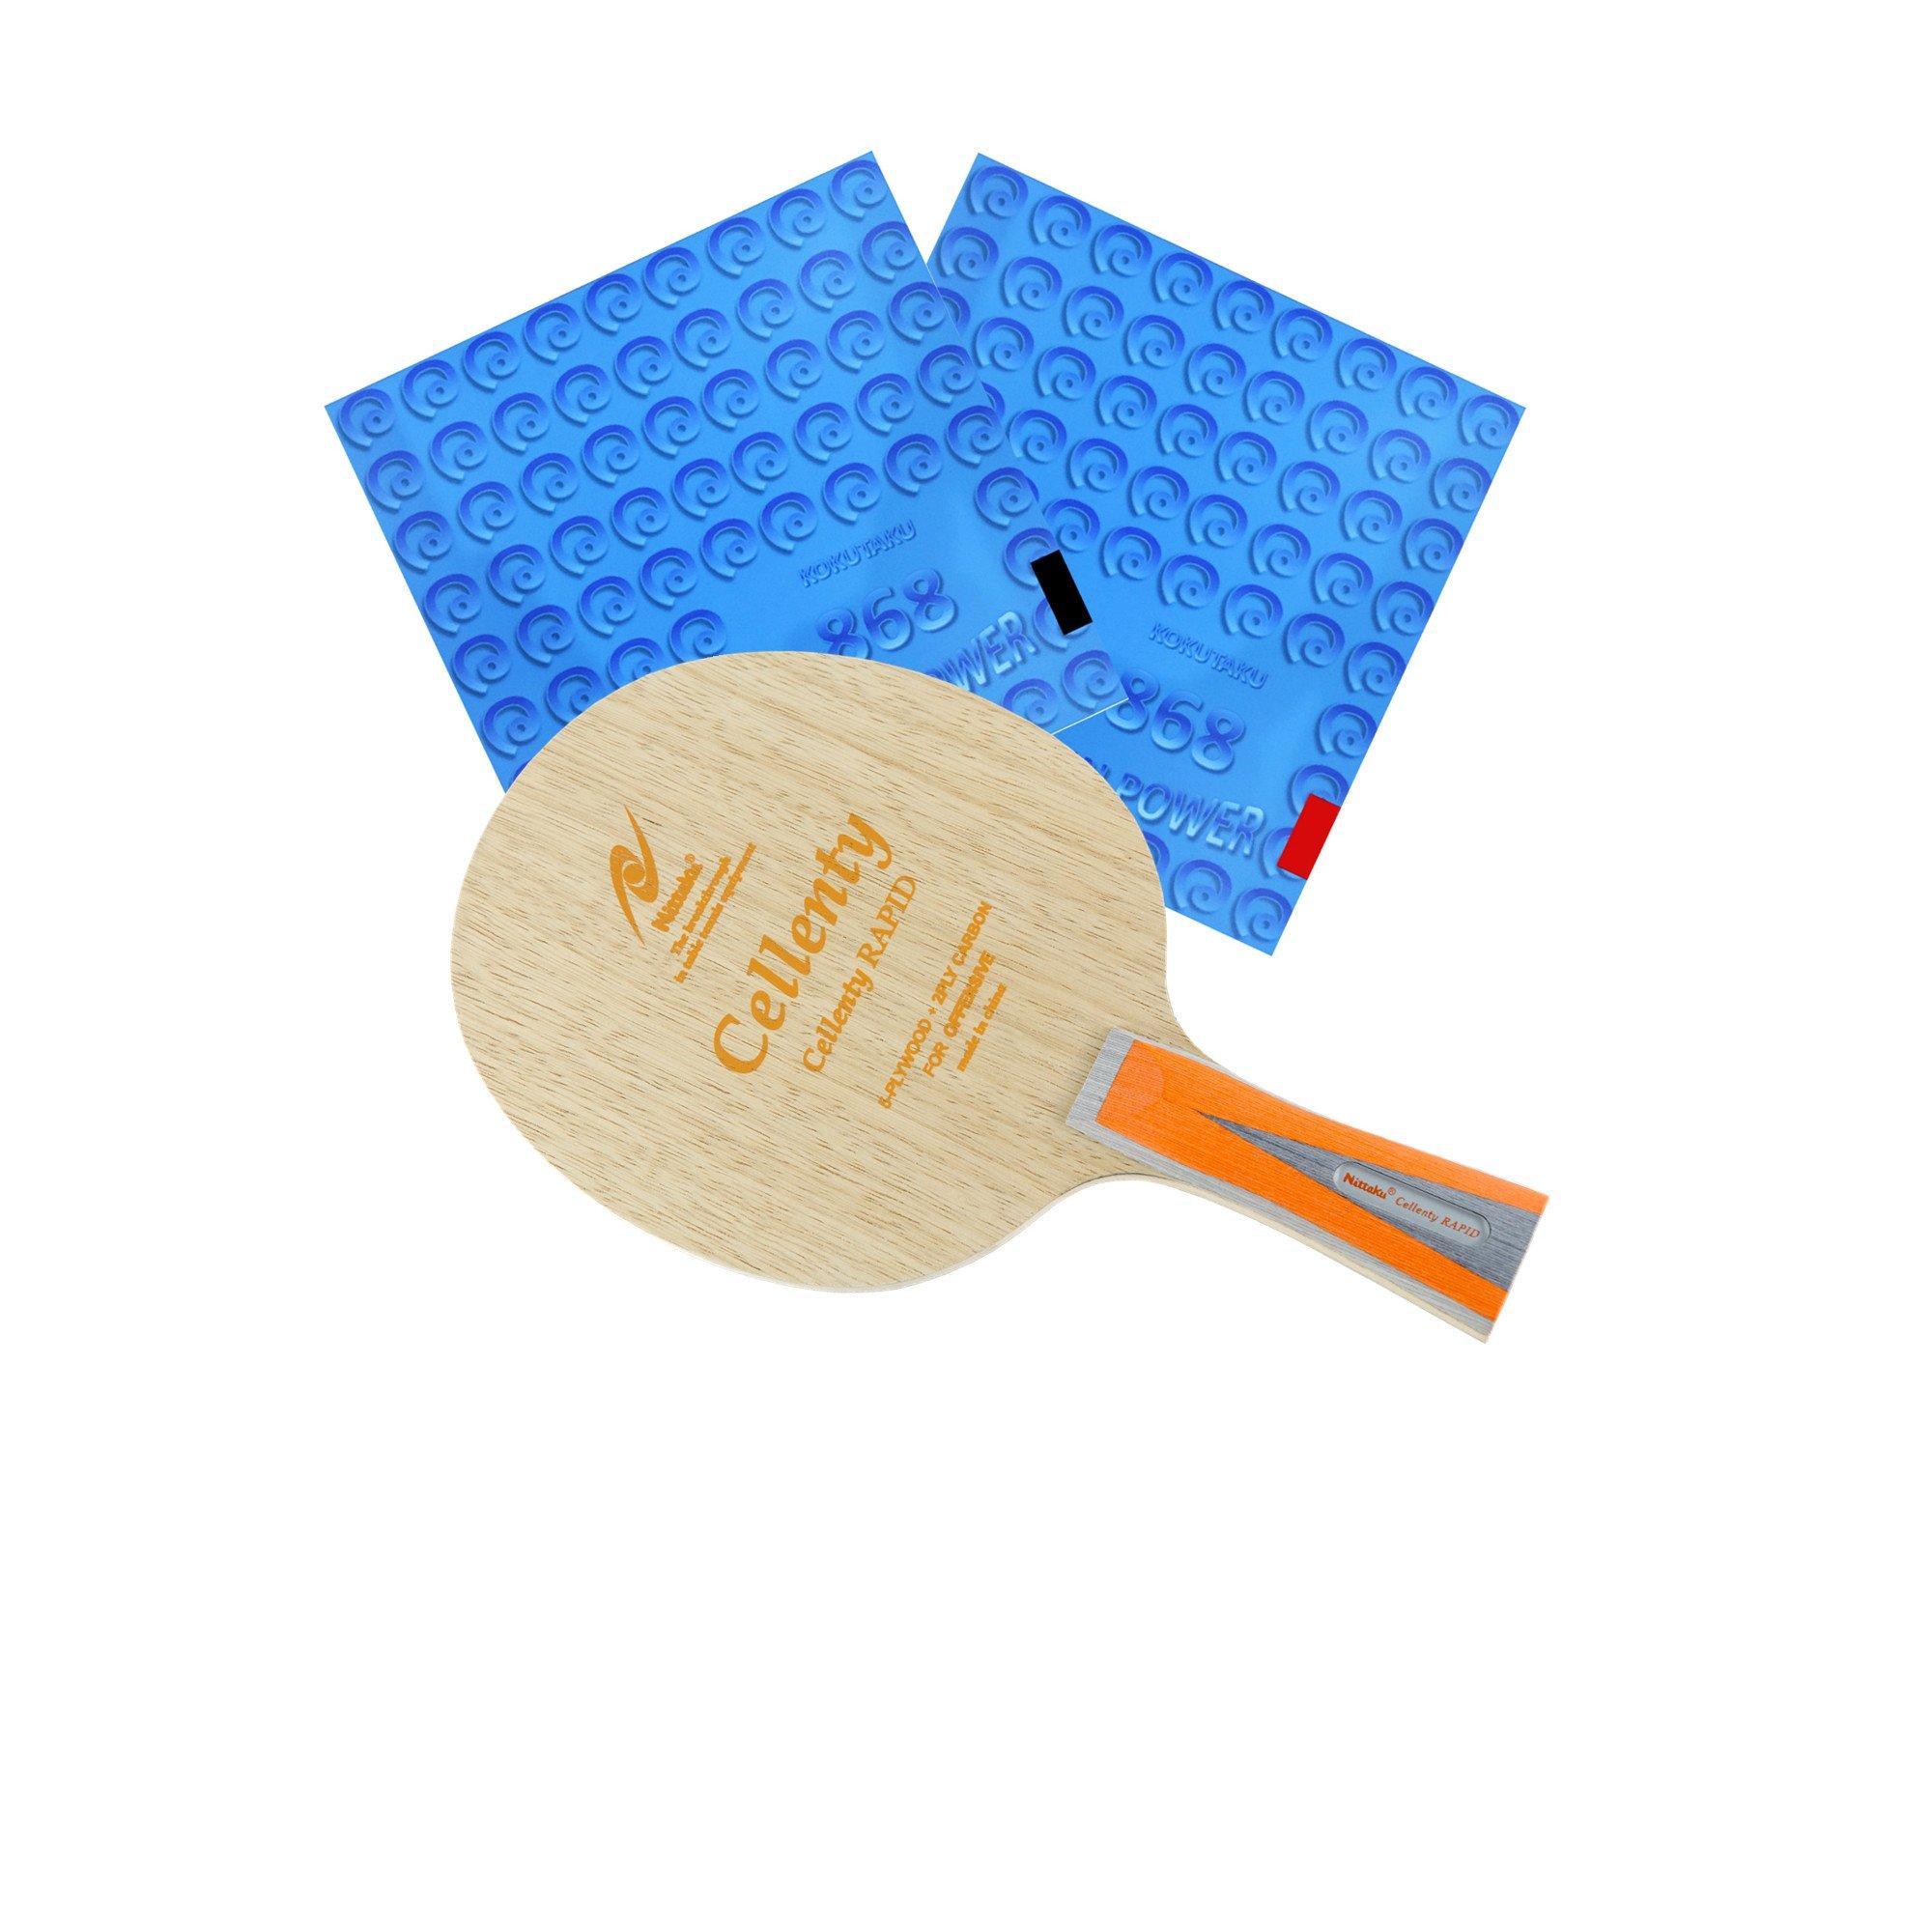 Nittaku Cellenty Rapid Carbon FL + 868 Spinpower Table Tennis Racket